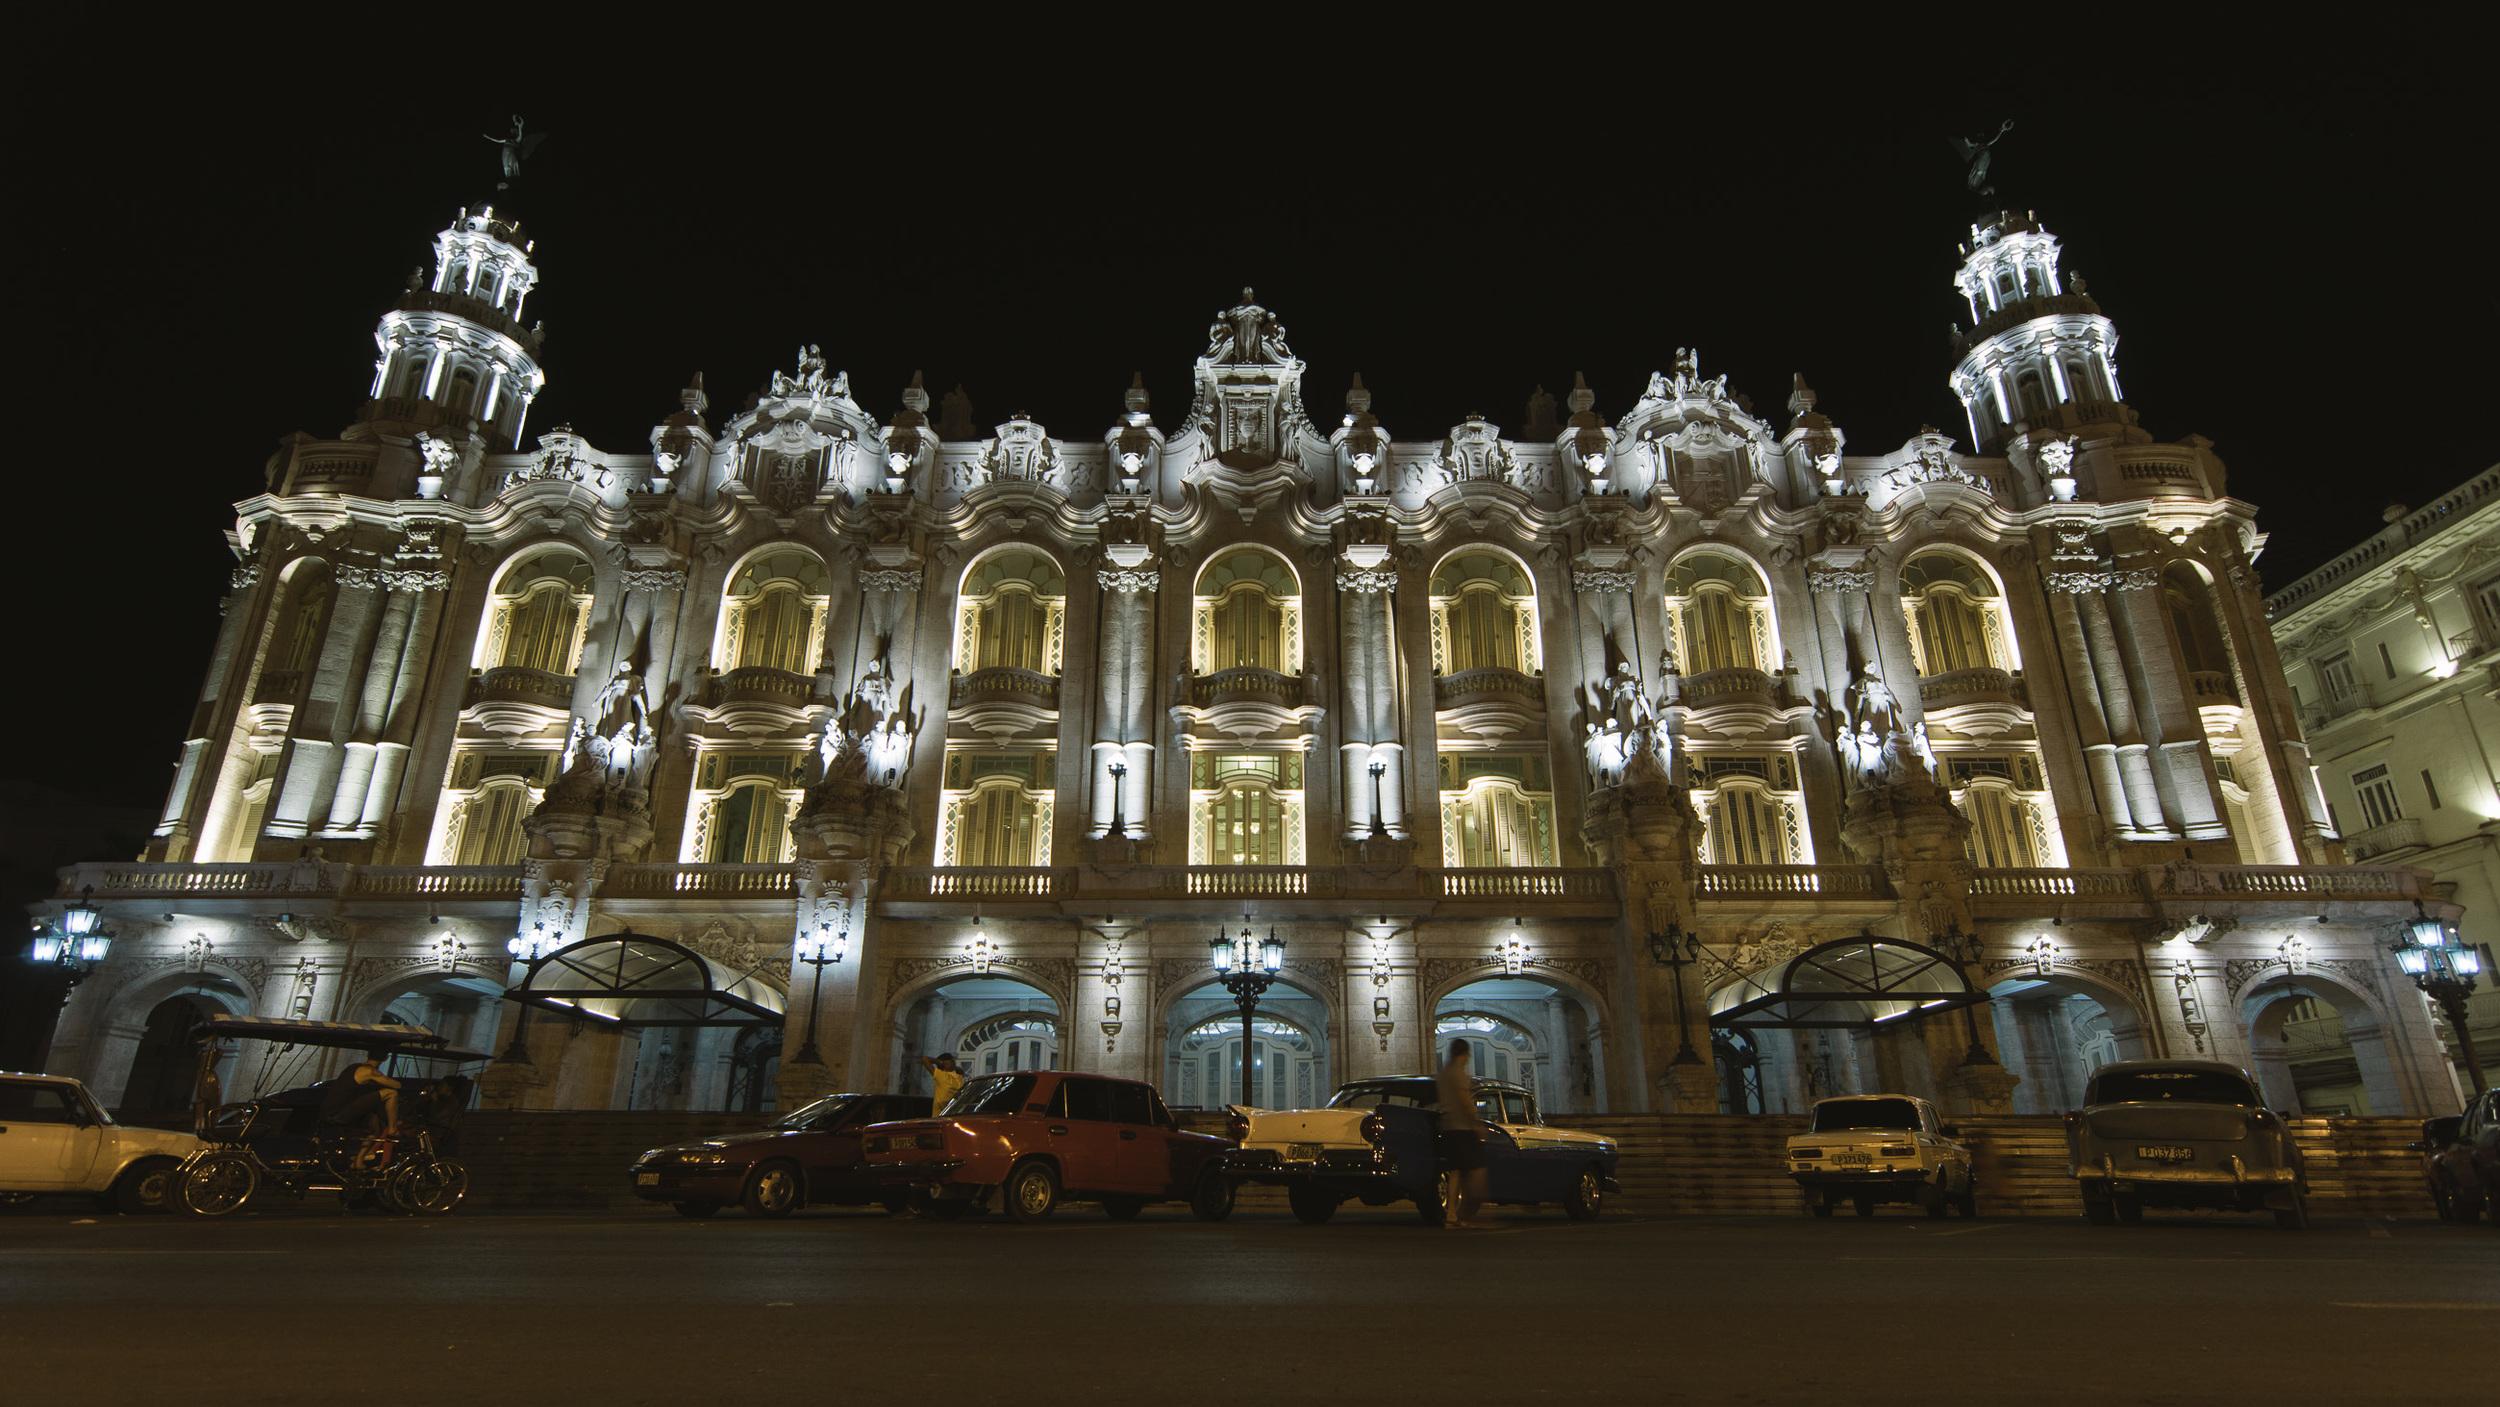 DeClaro-Photography-Cuba-02234.jpg